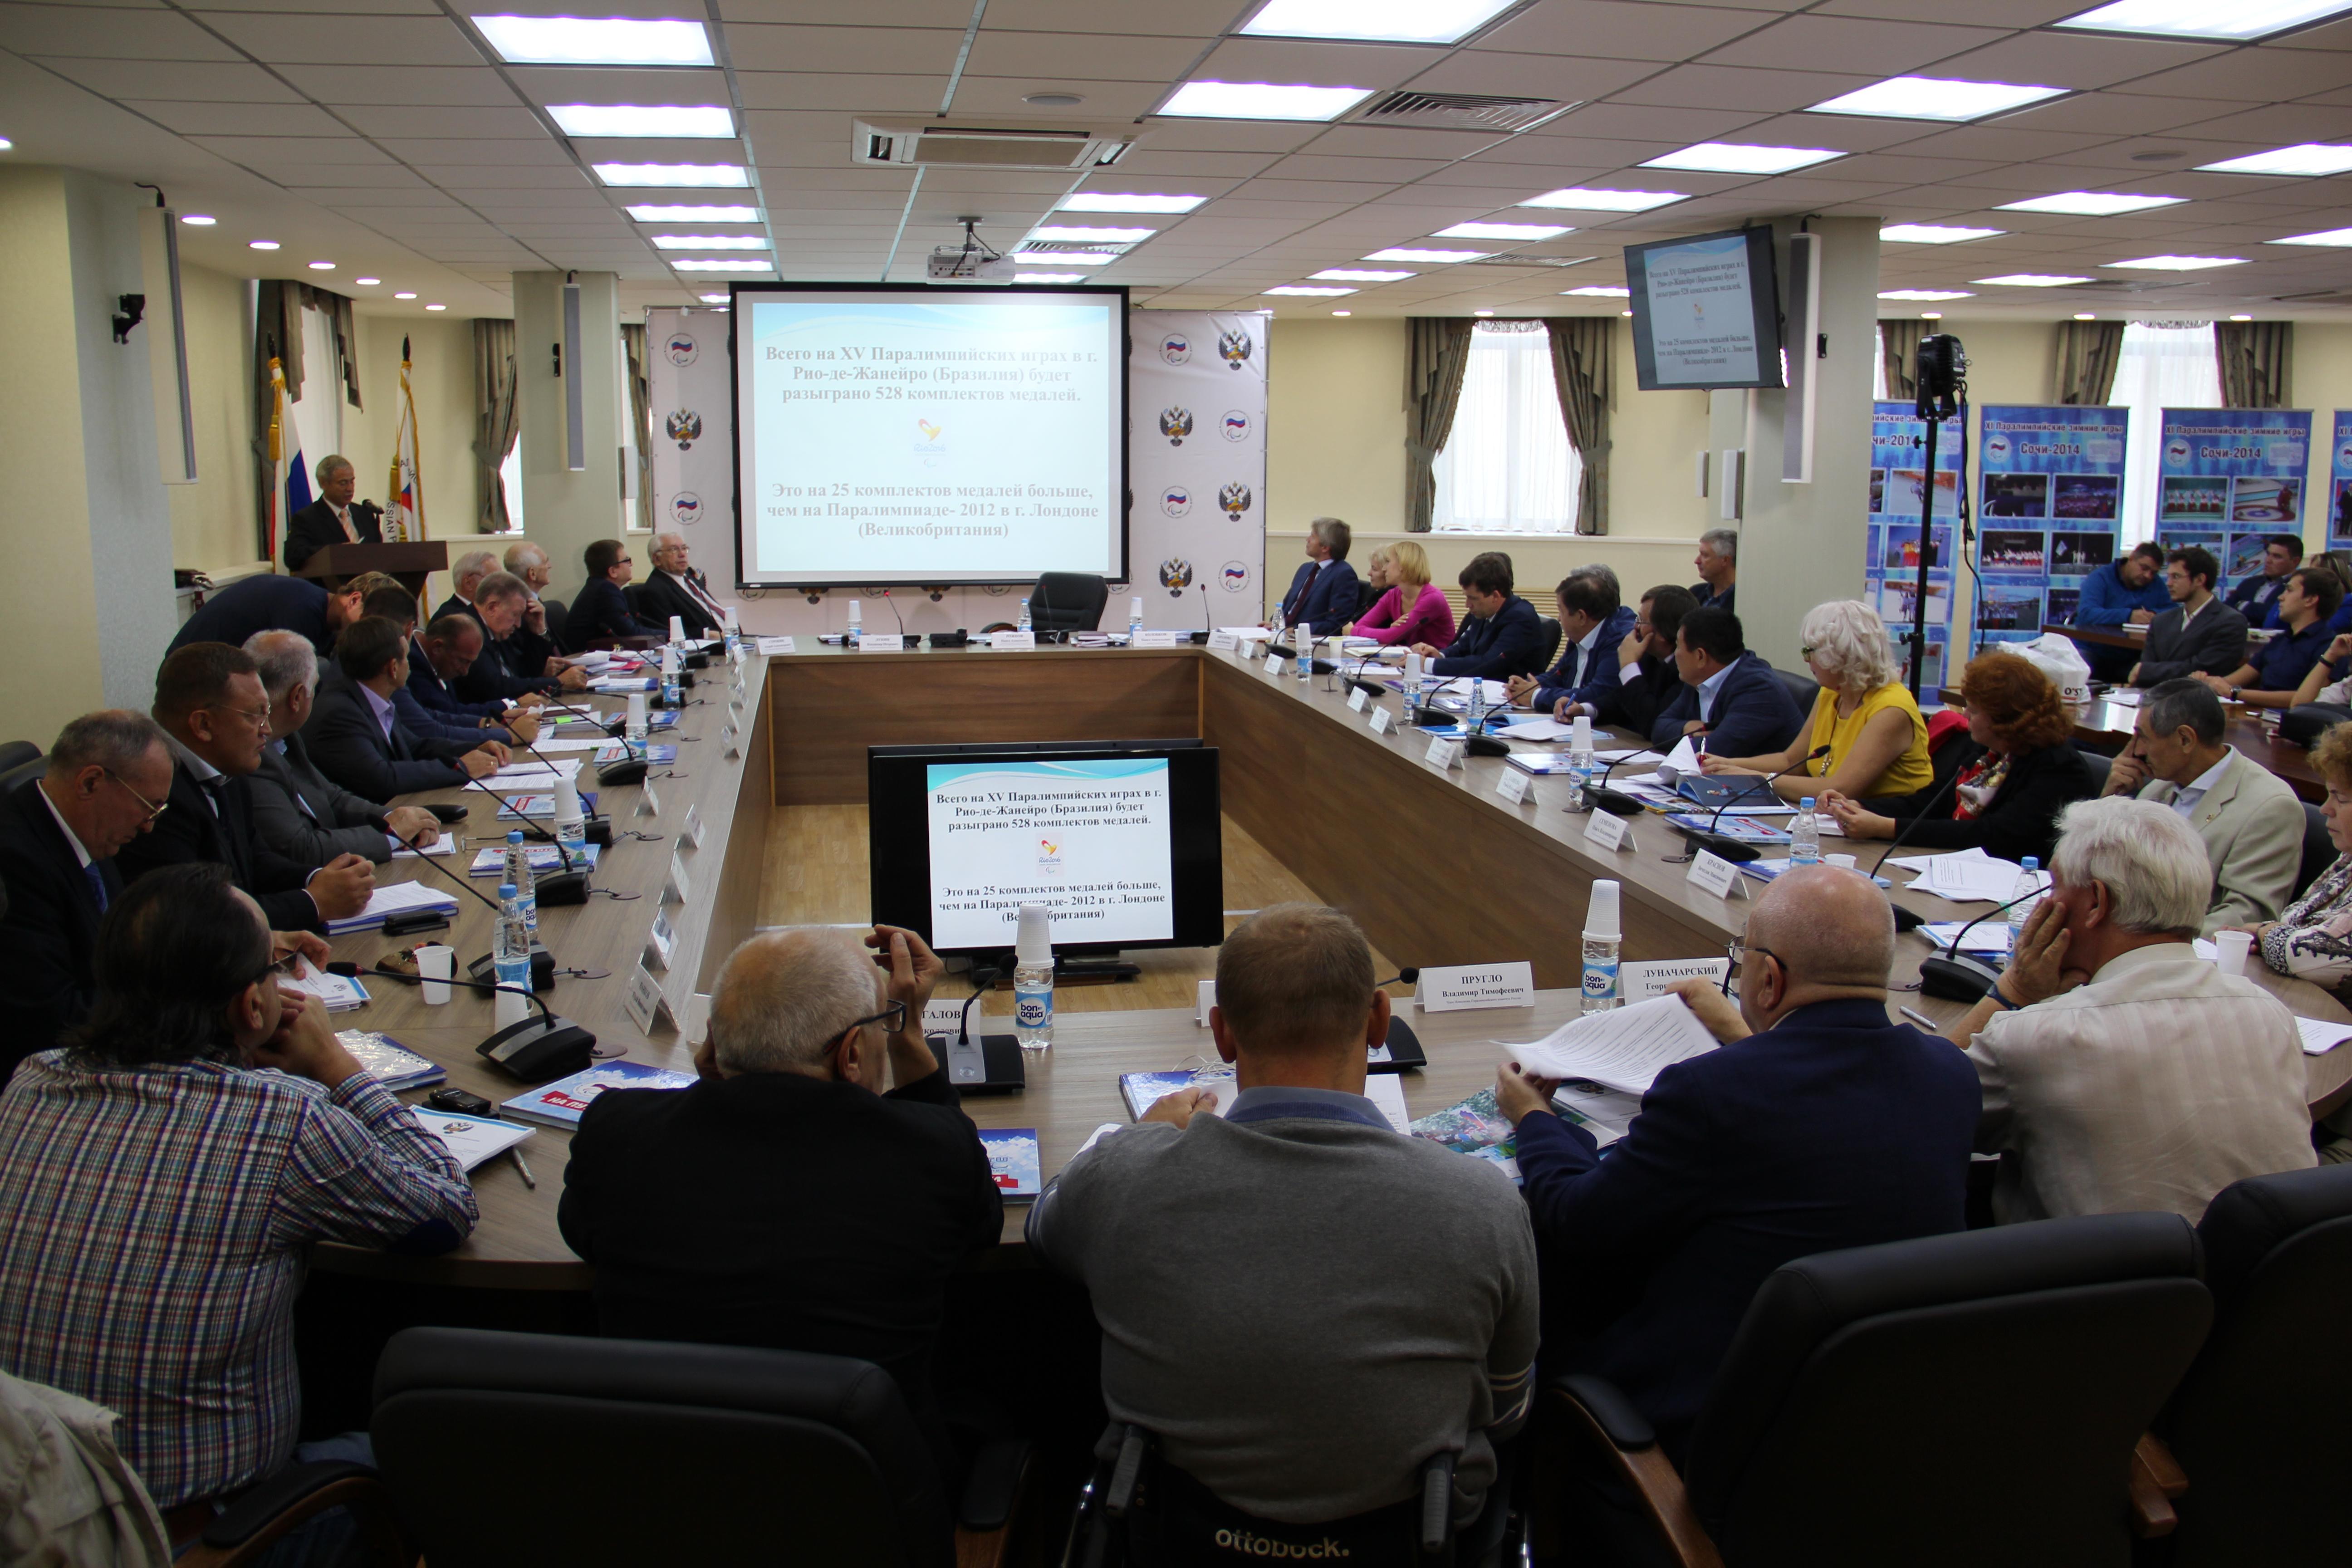 29 августа 2014 года в зале Исполкома ПКР состоялось заседание Исполкома ПКР под руководством президента ПКР В.П. Лукина